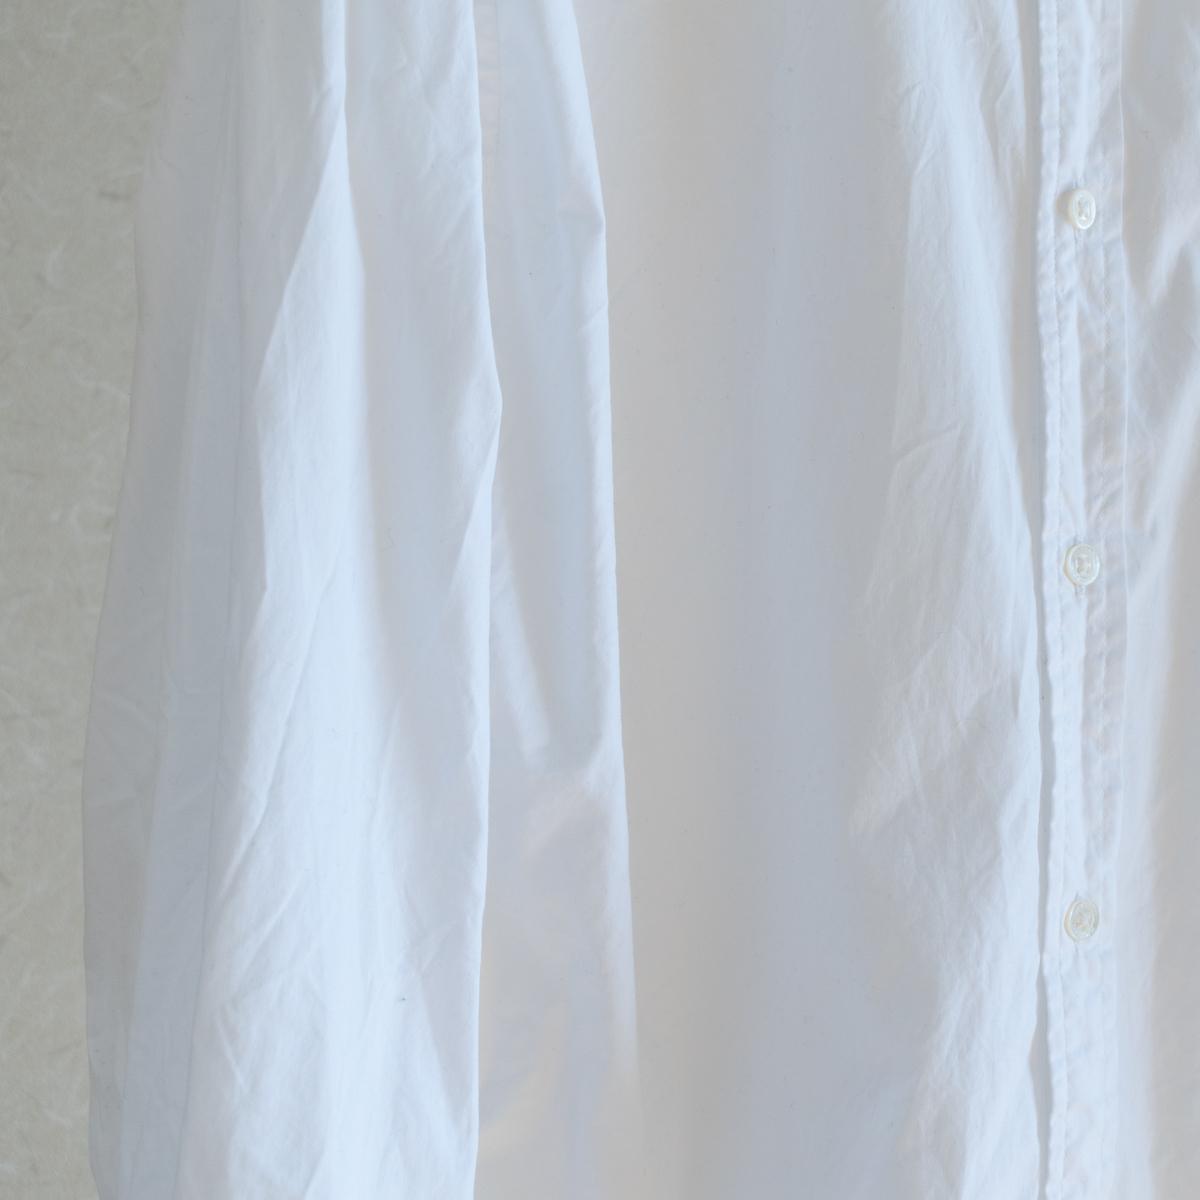 f:id:yamada0221:20200213155756j:plain